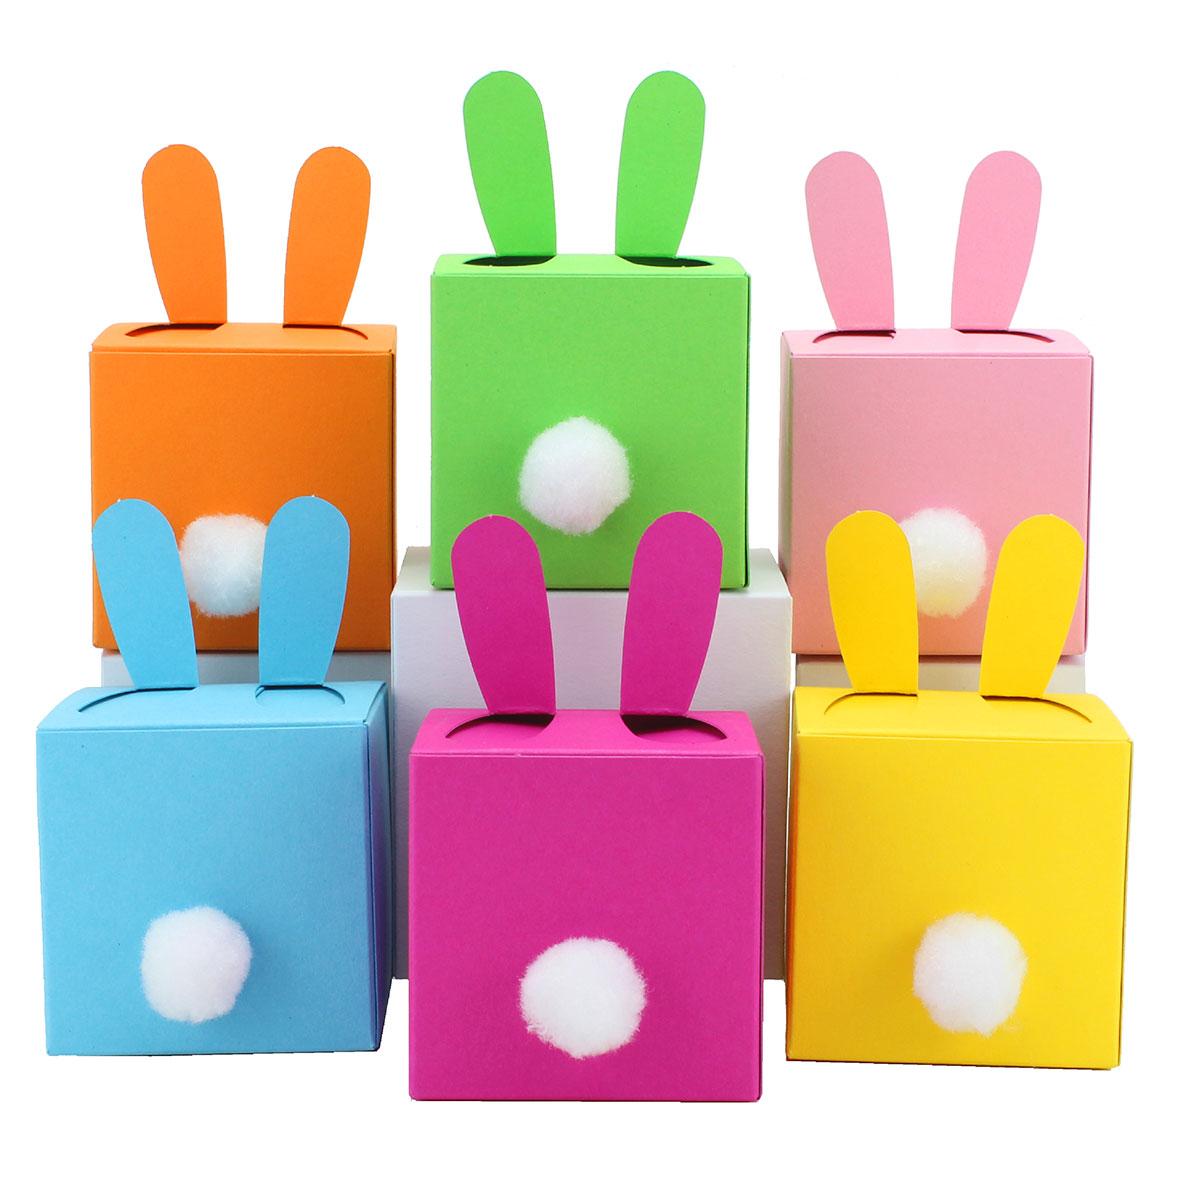 diy osterhasen kisten zum selber bef llen 6 bunte boxen i schachteln papierdrachen. Black Bedroom Furniture Sets. Home Design Ideas